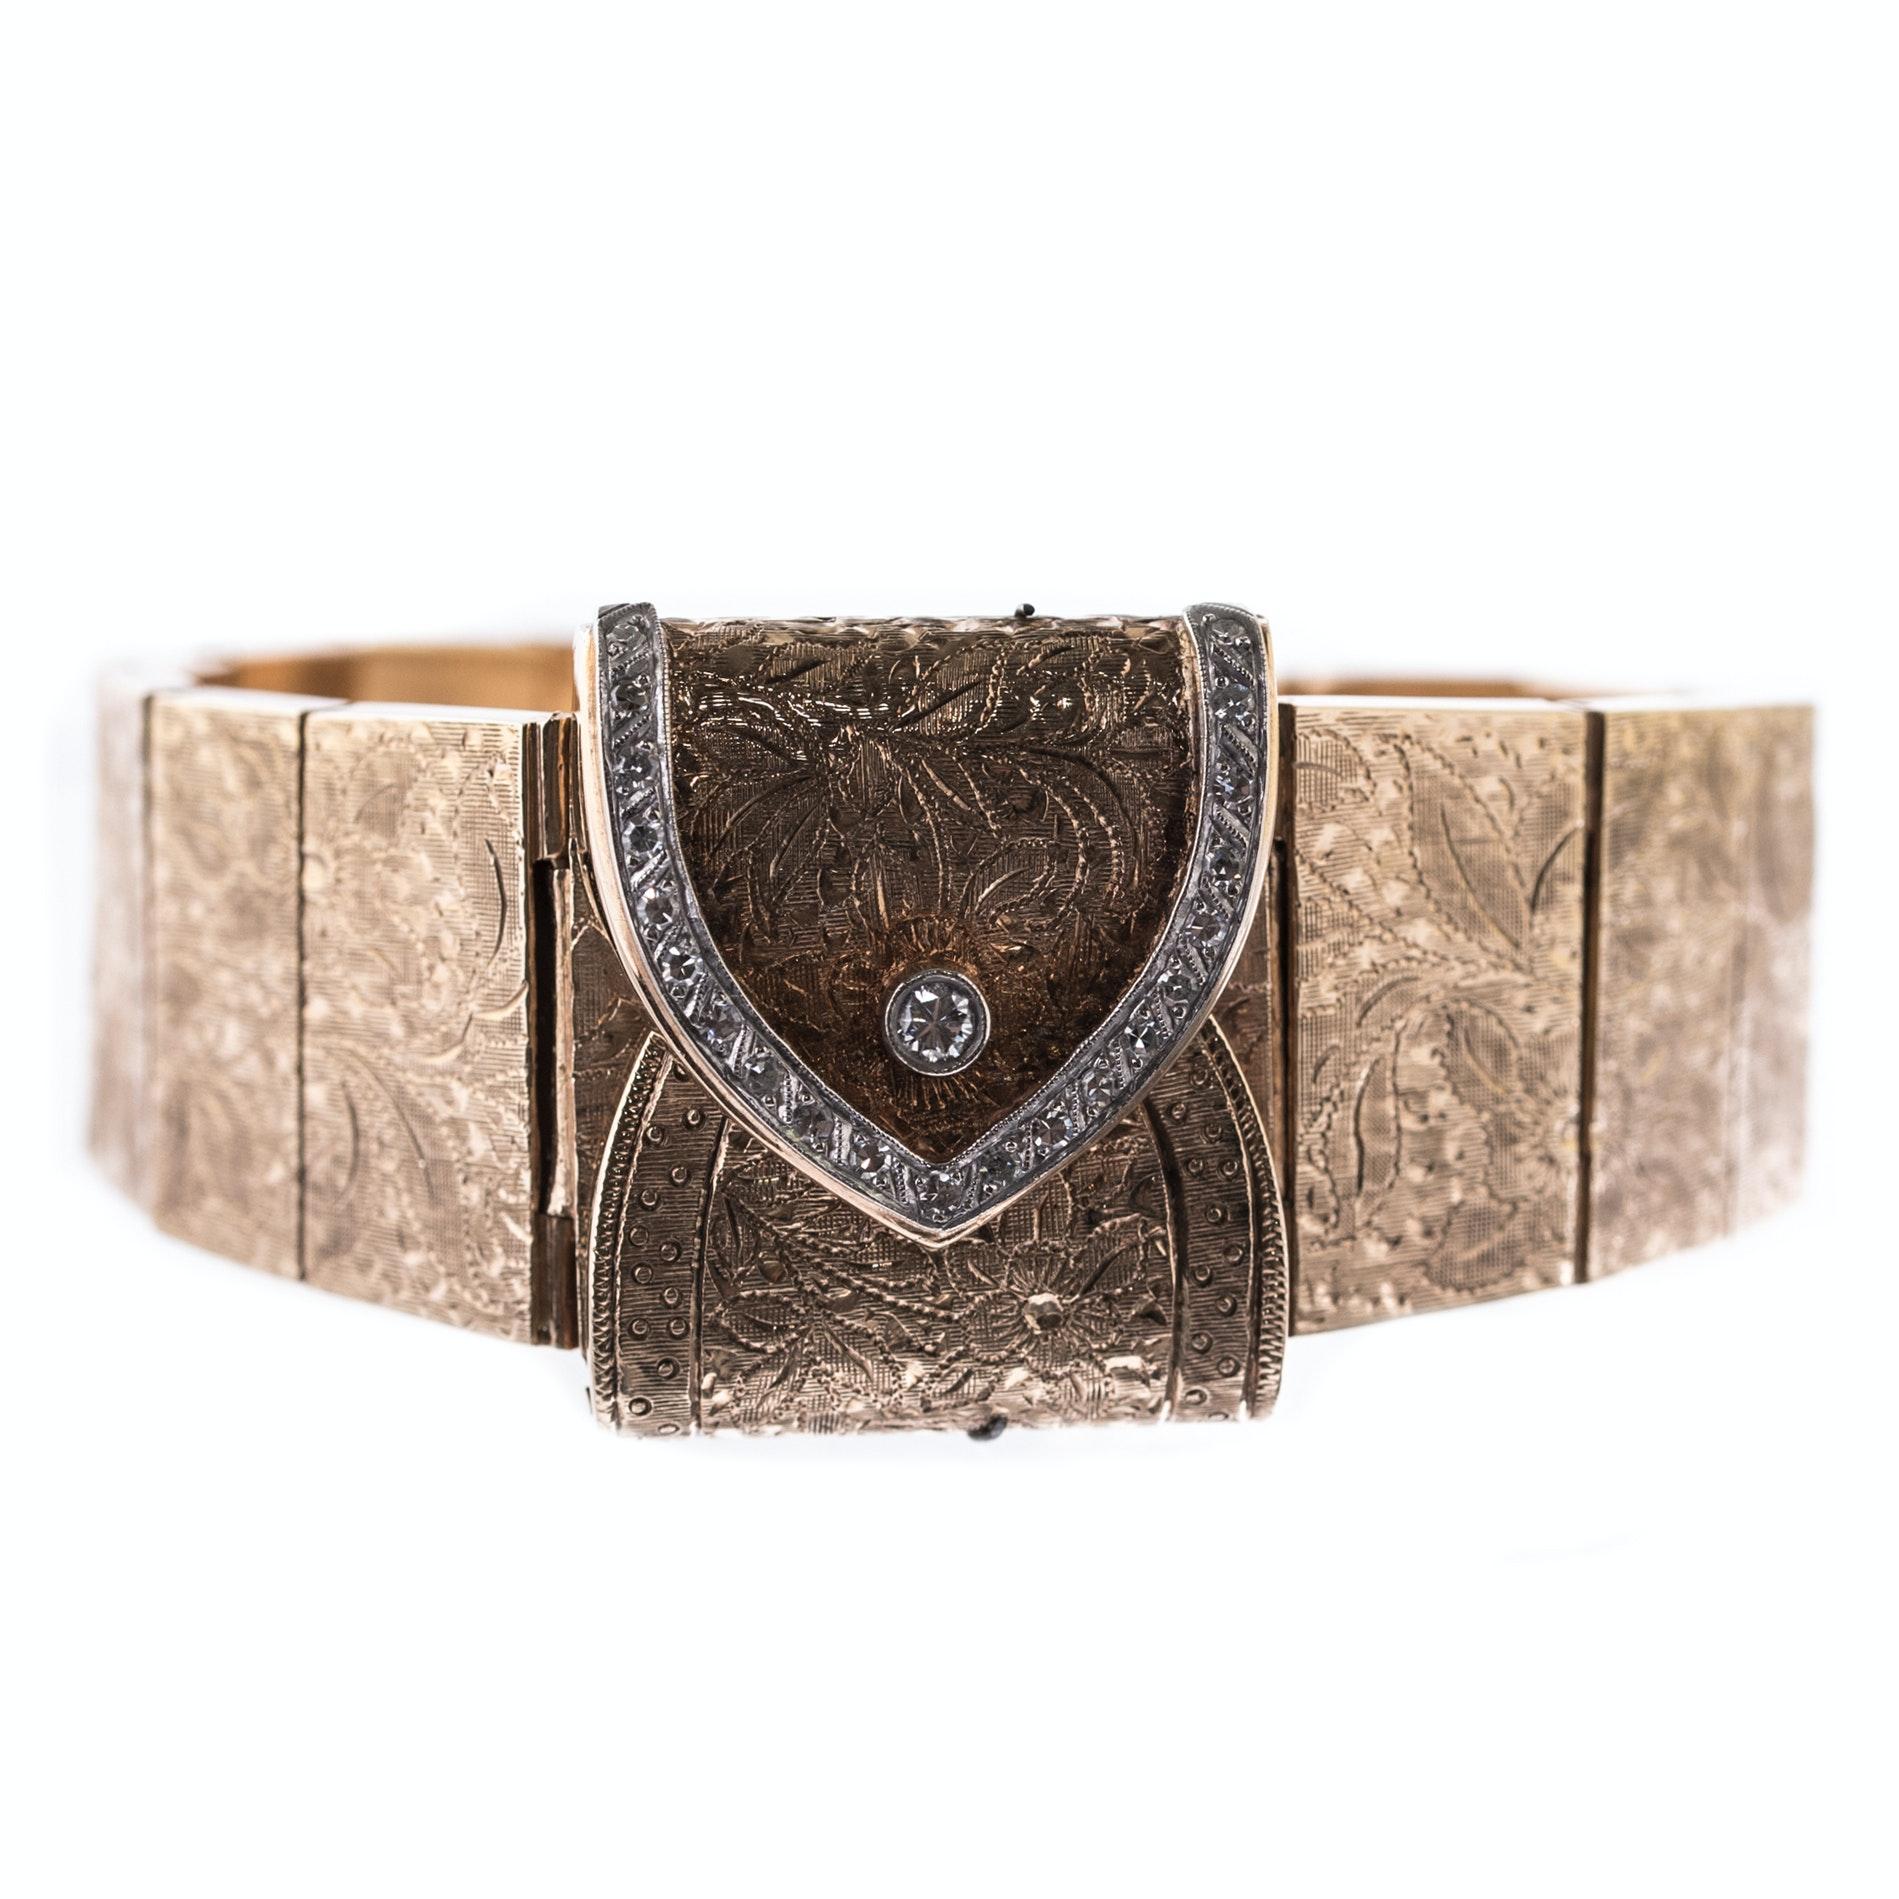 Vintage 14K Yellow Gold and Diamond Bracelet Wristwatch